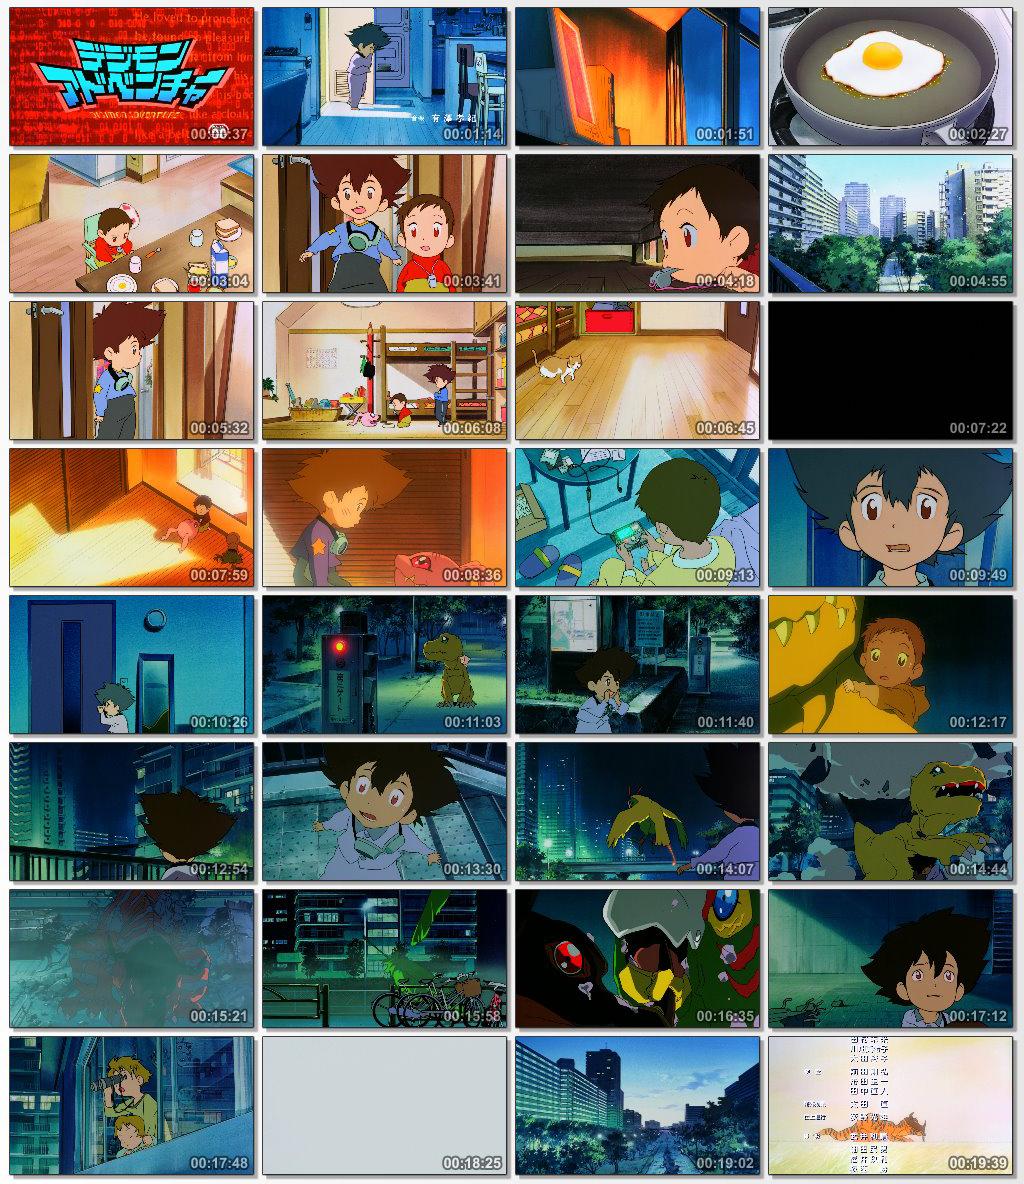 دانلود انیمیشن کارتونی Digimon The Movie 2000